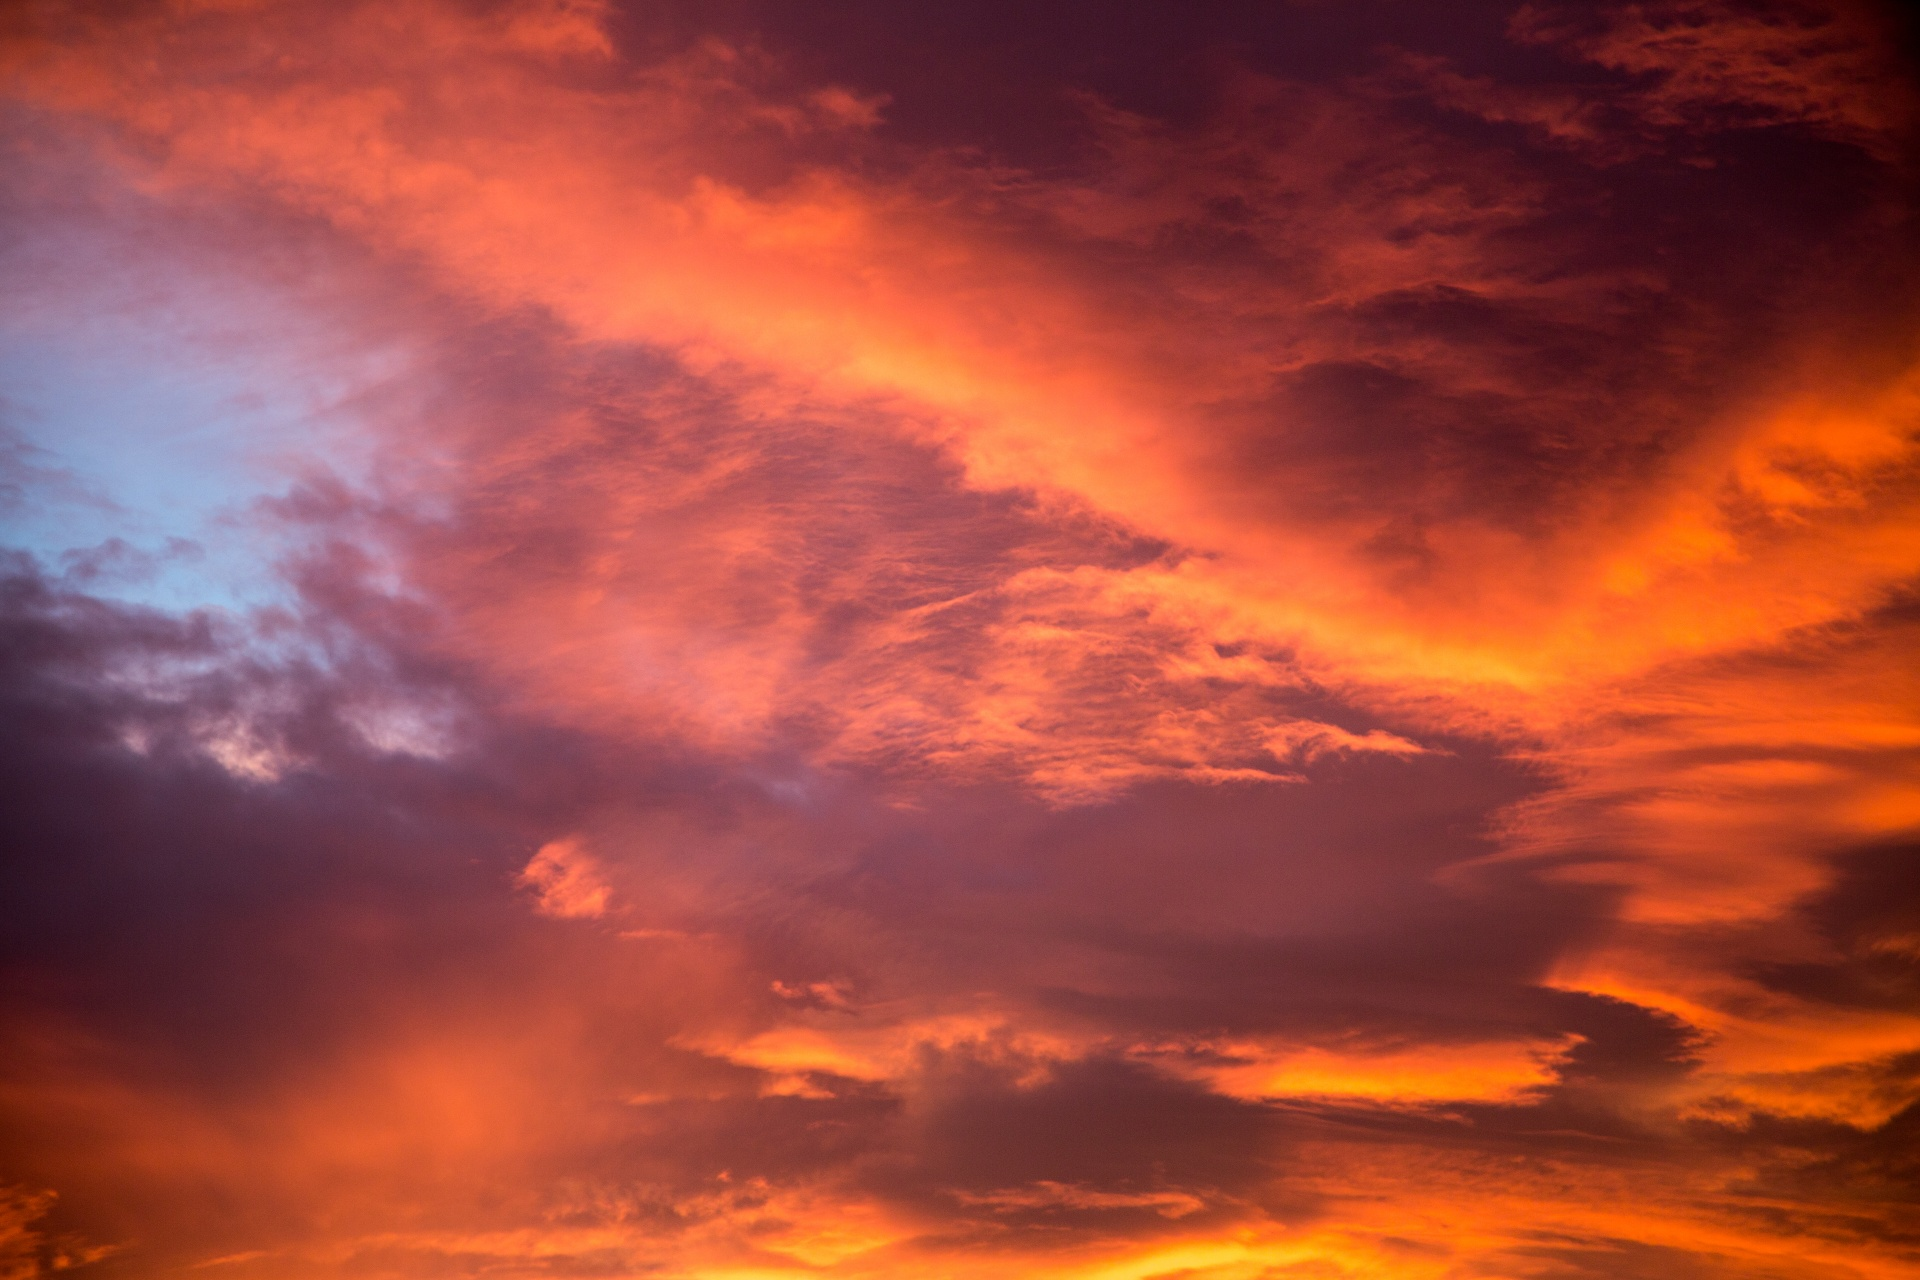 Orange Color Wallpaper Hd Sunset Sky Free Stock Photo Public Domain Pictures